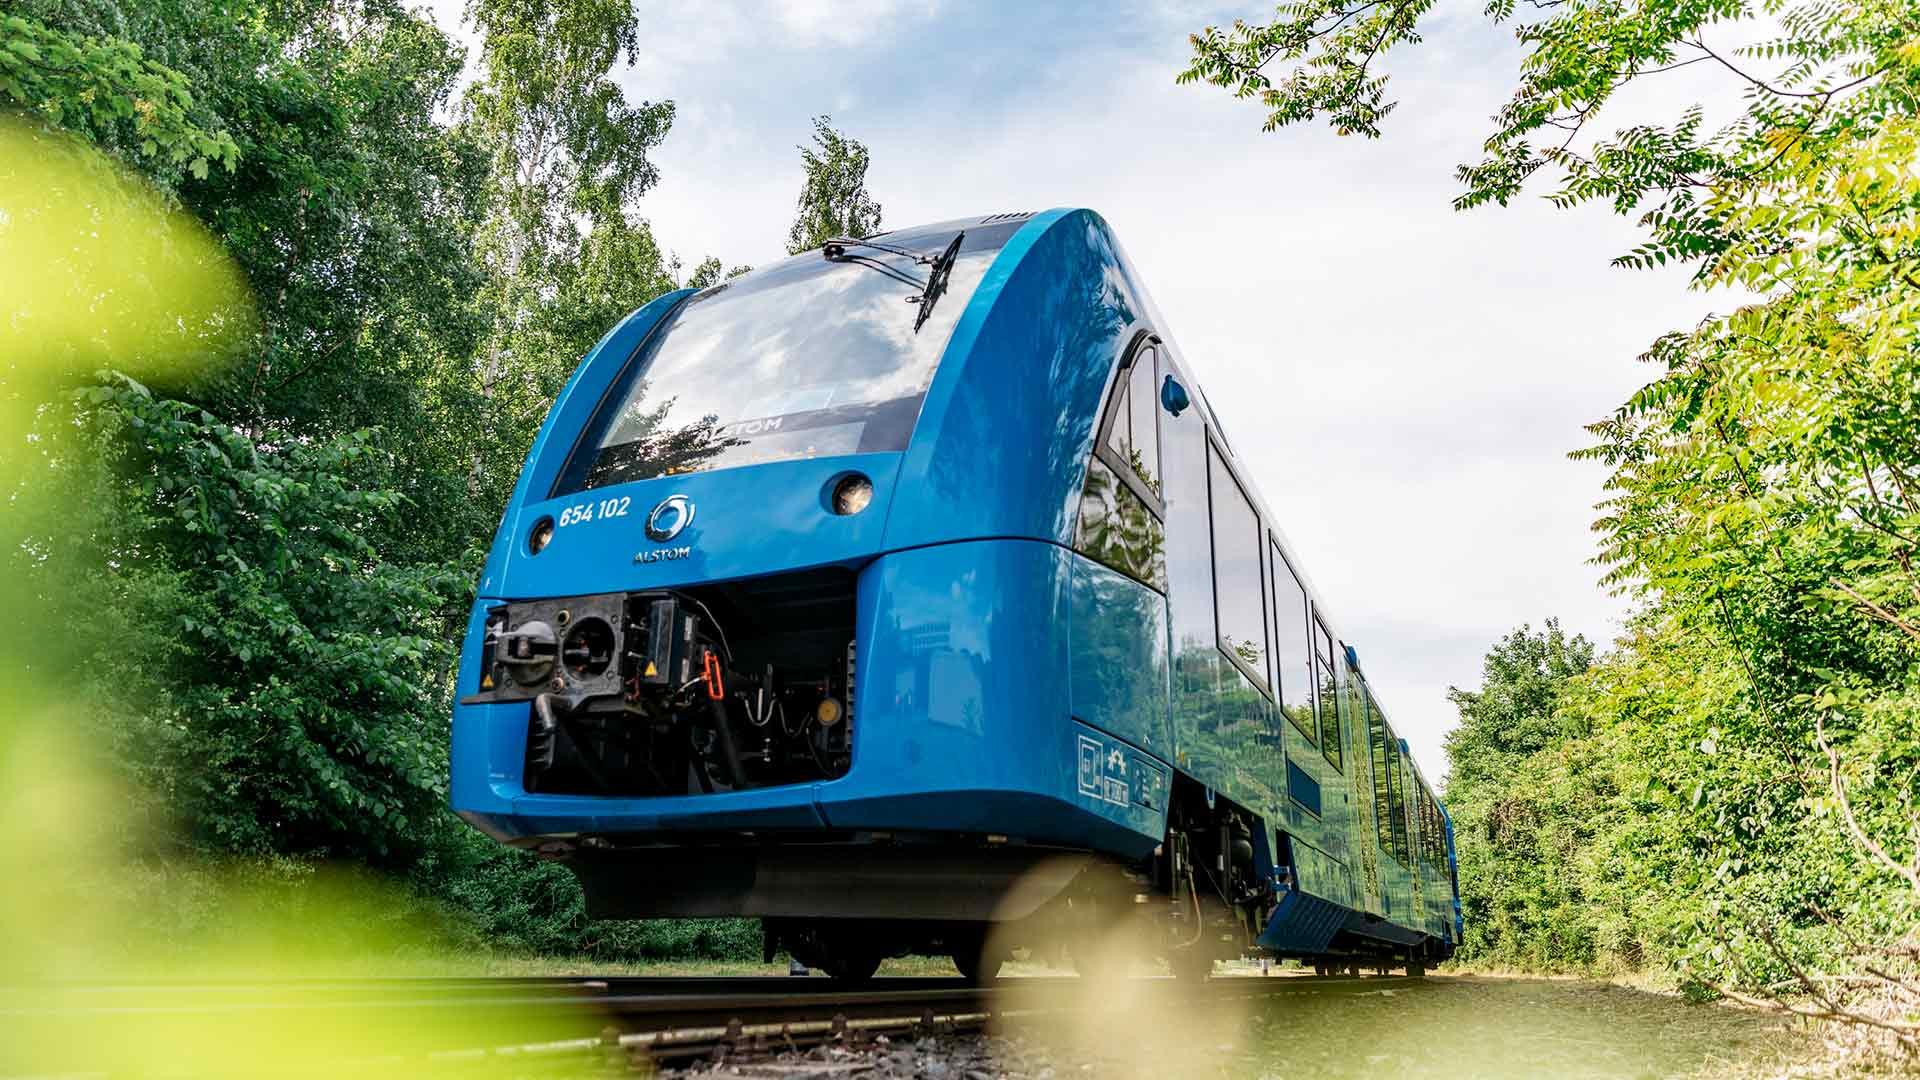 https://kaitrade.cz/media/aktuality/testing/palivove-clanky/hydrogen-powered-train-coradia-ilint-2018.jpg